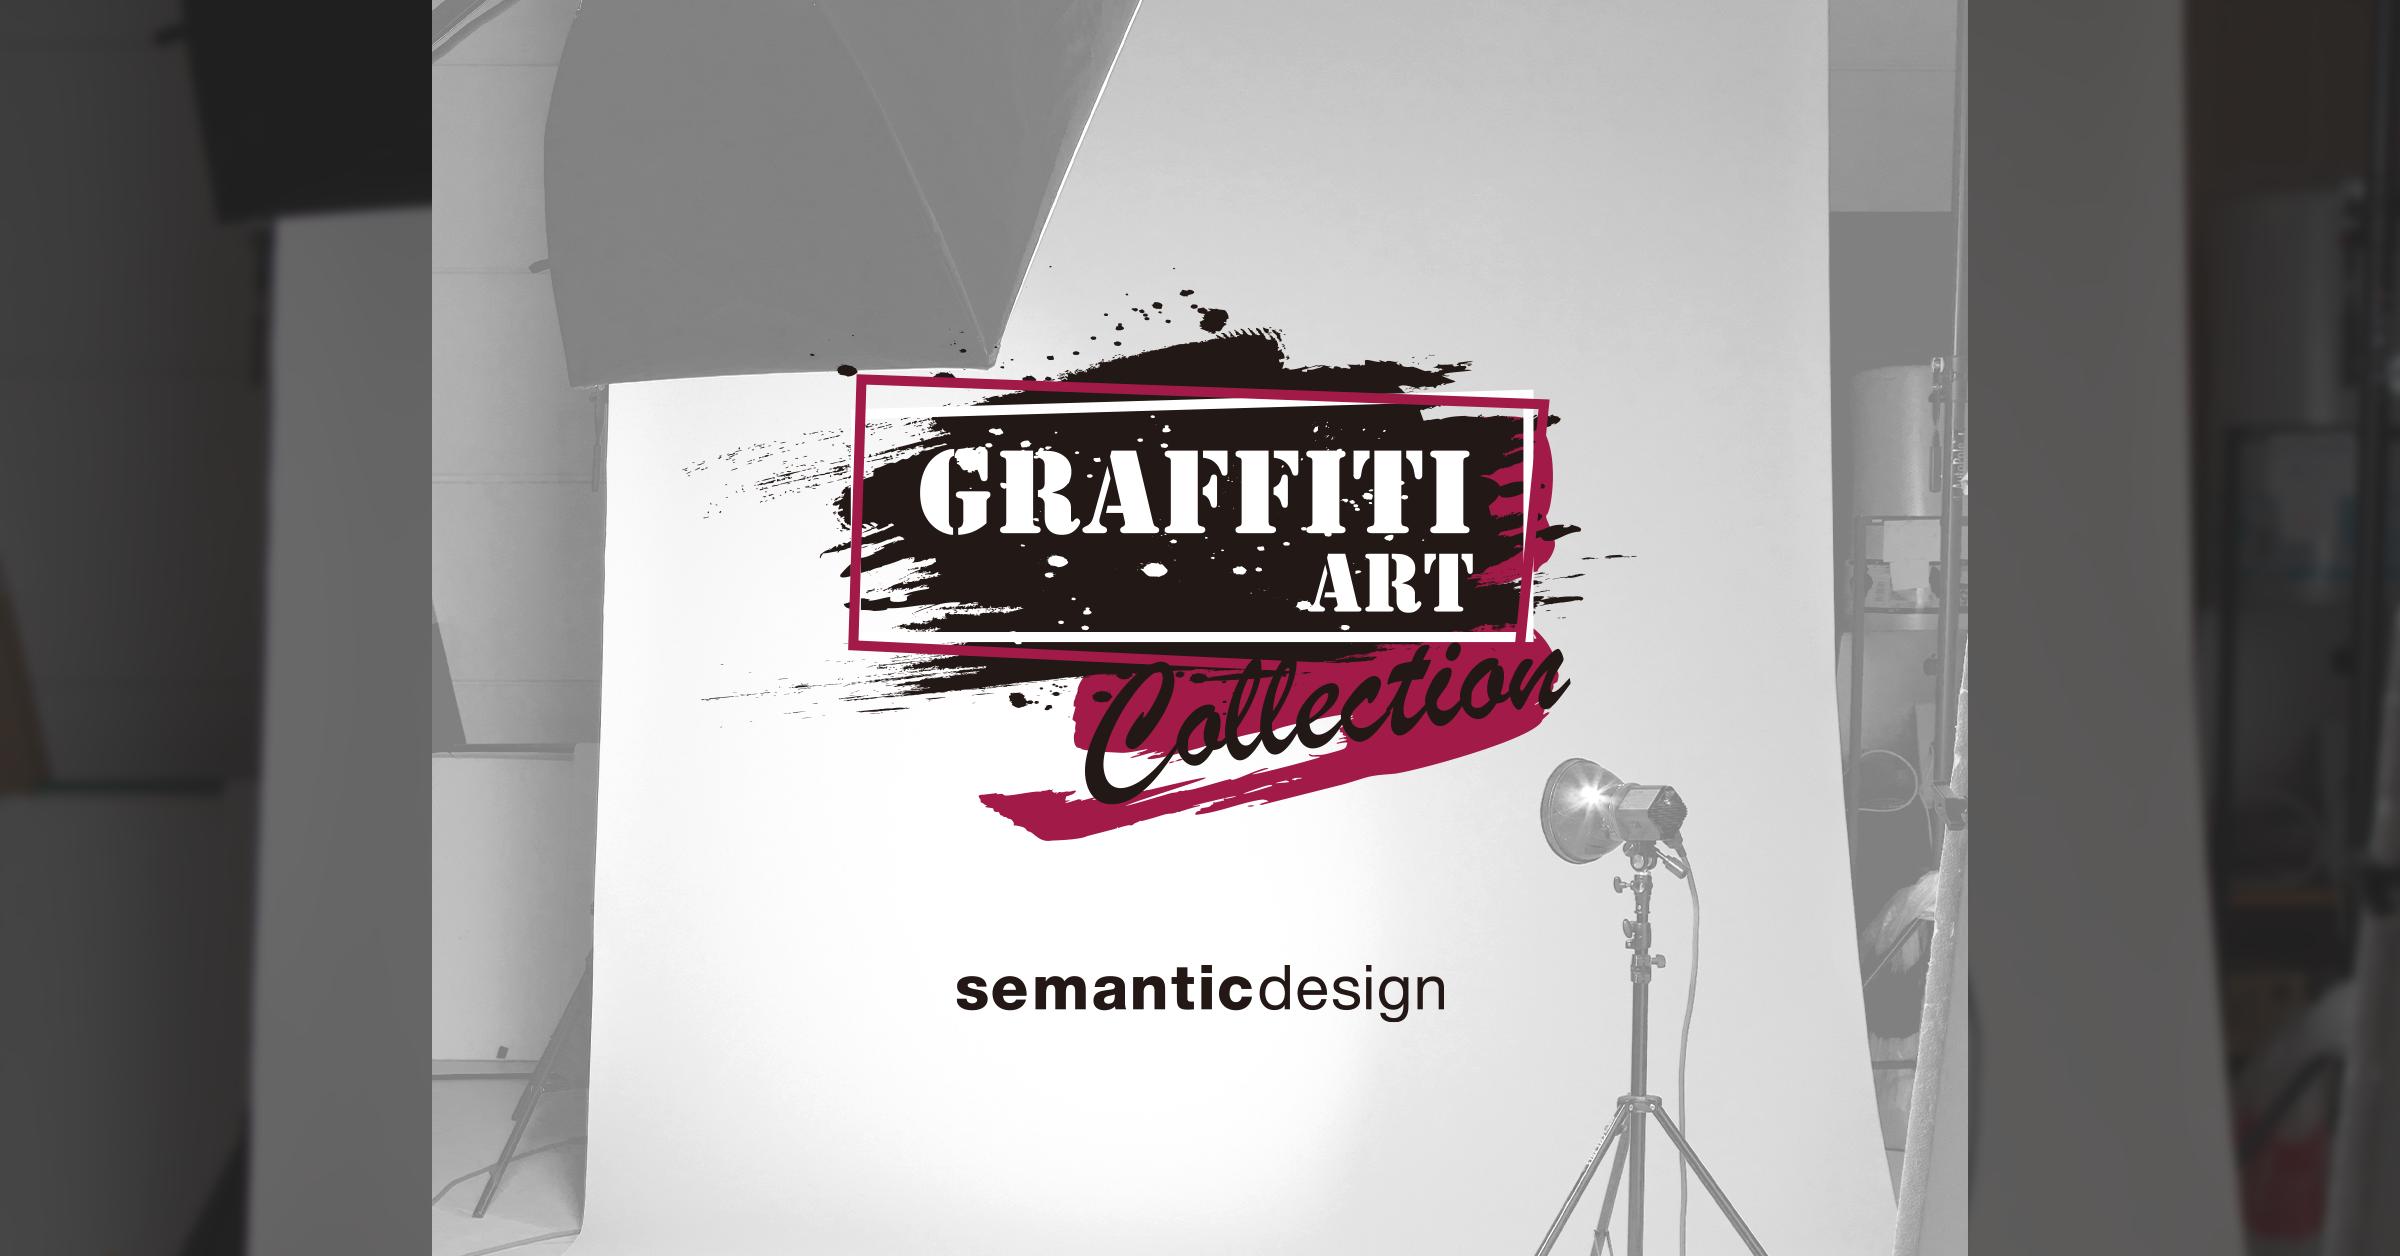 GRAFFITI ART COLLECTION